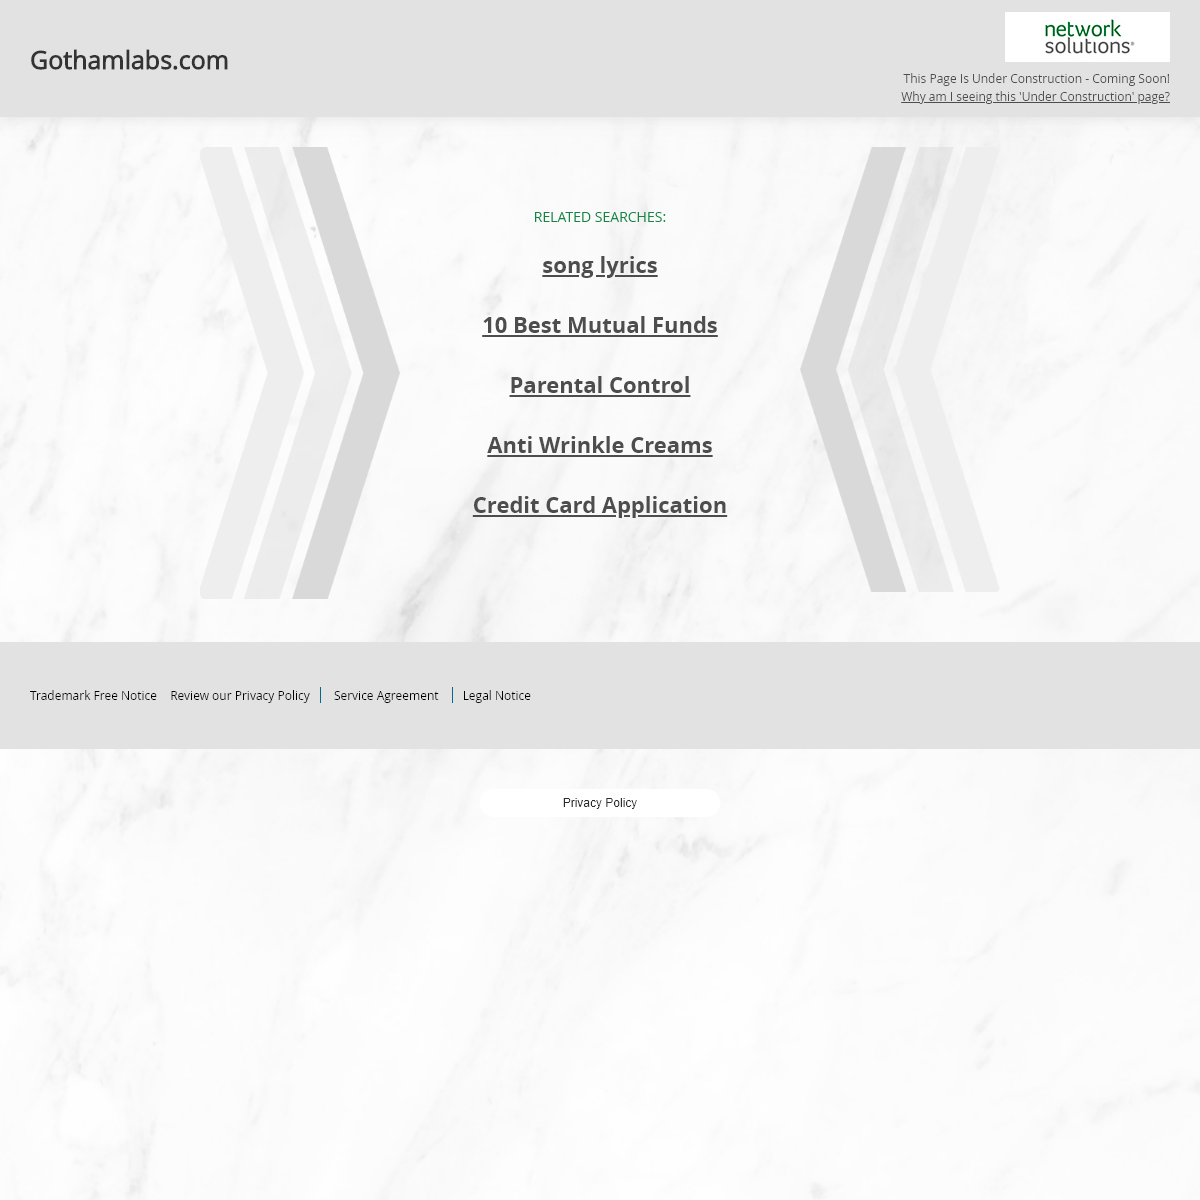 Gothamlabs.com